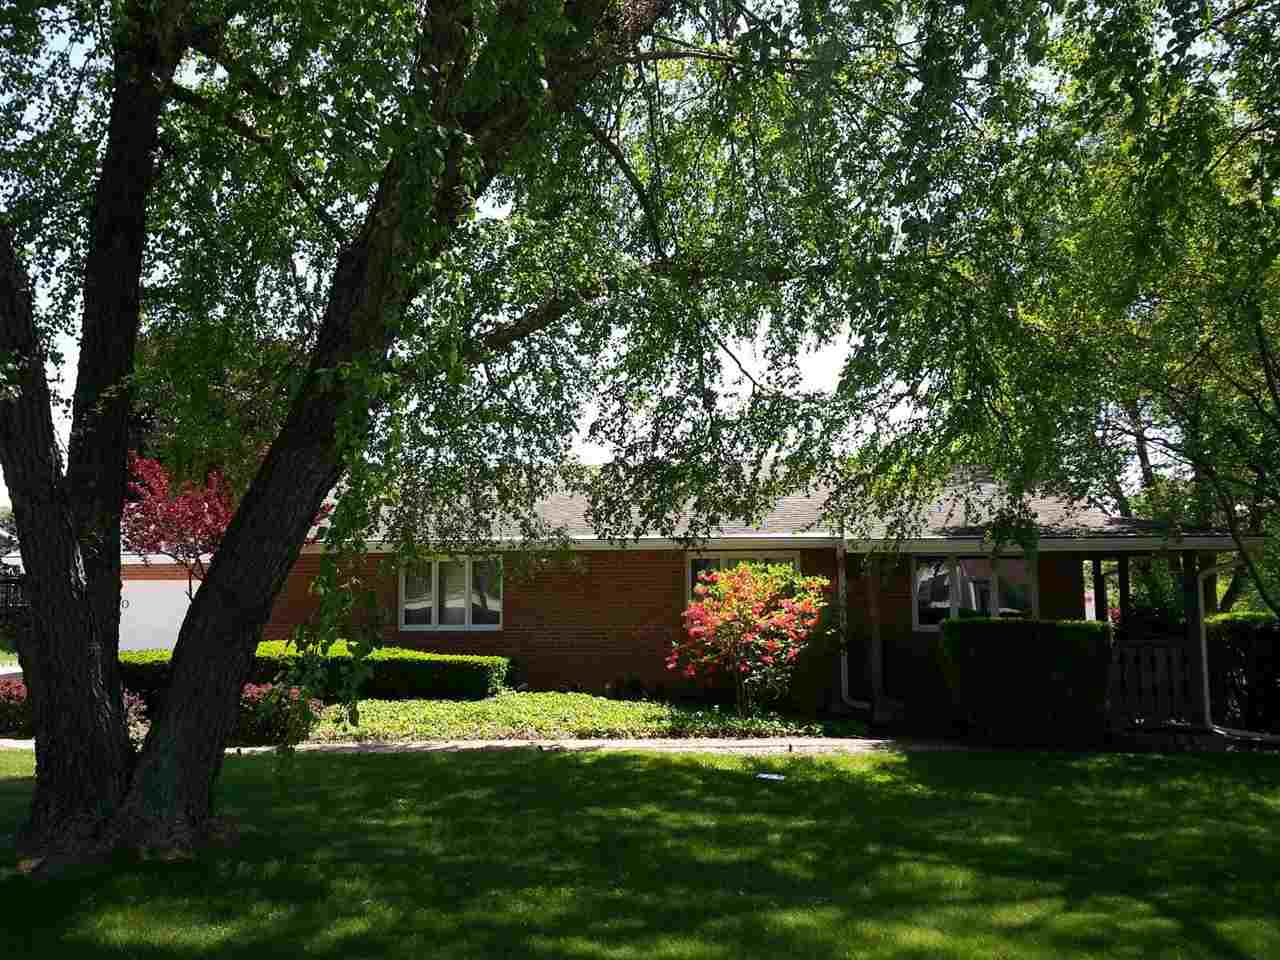 Real Estate for Sale, ListingId: 31323143, Sherrard,IL61281